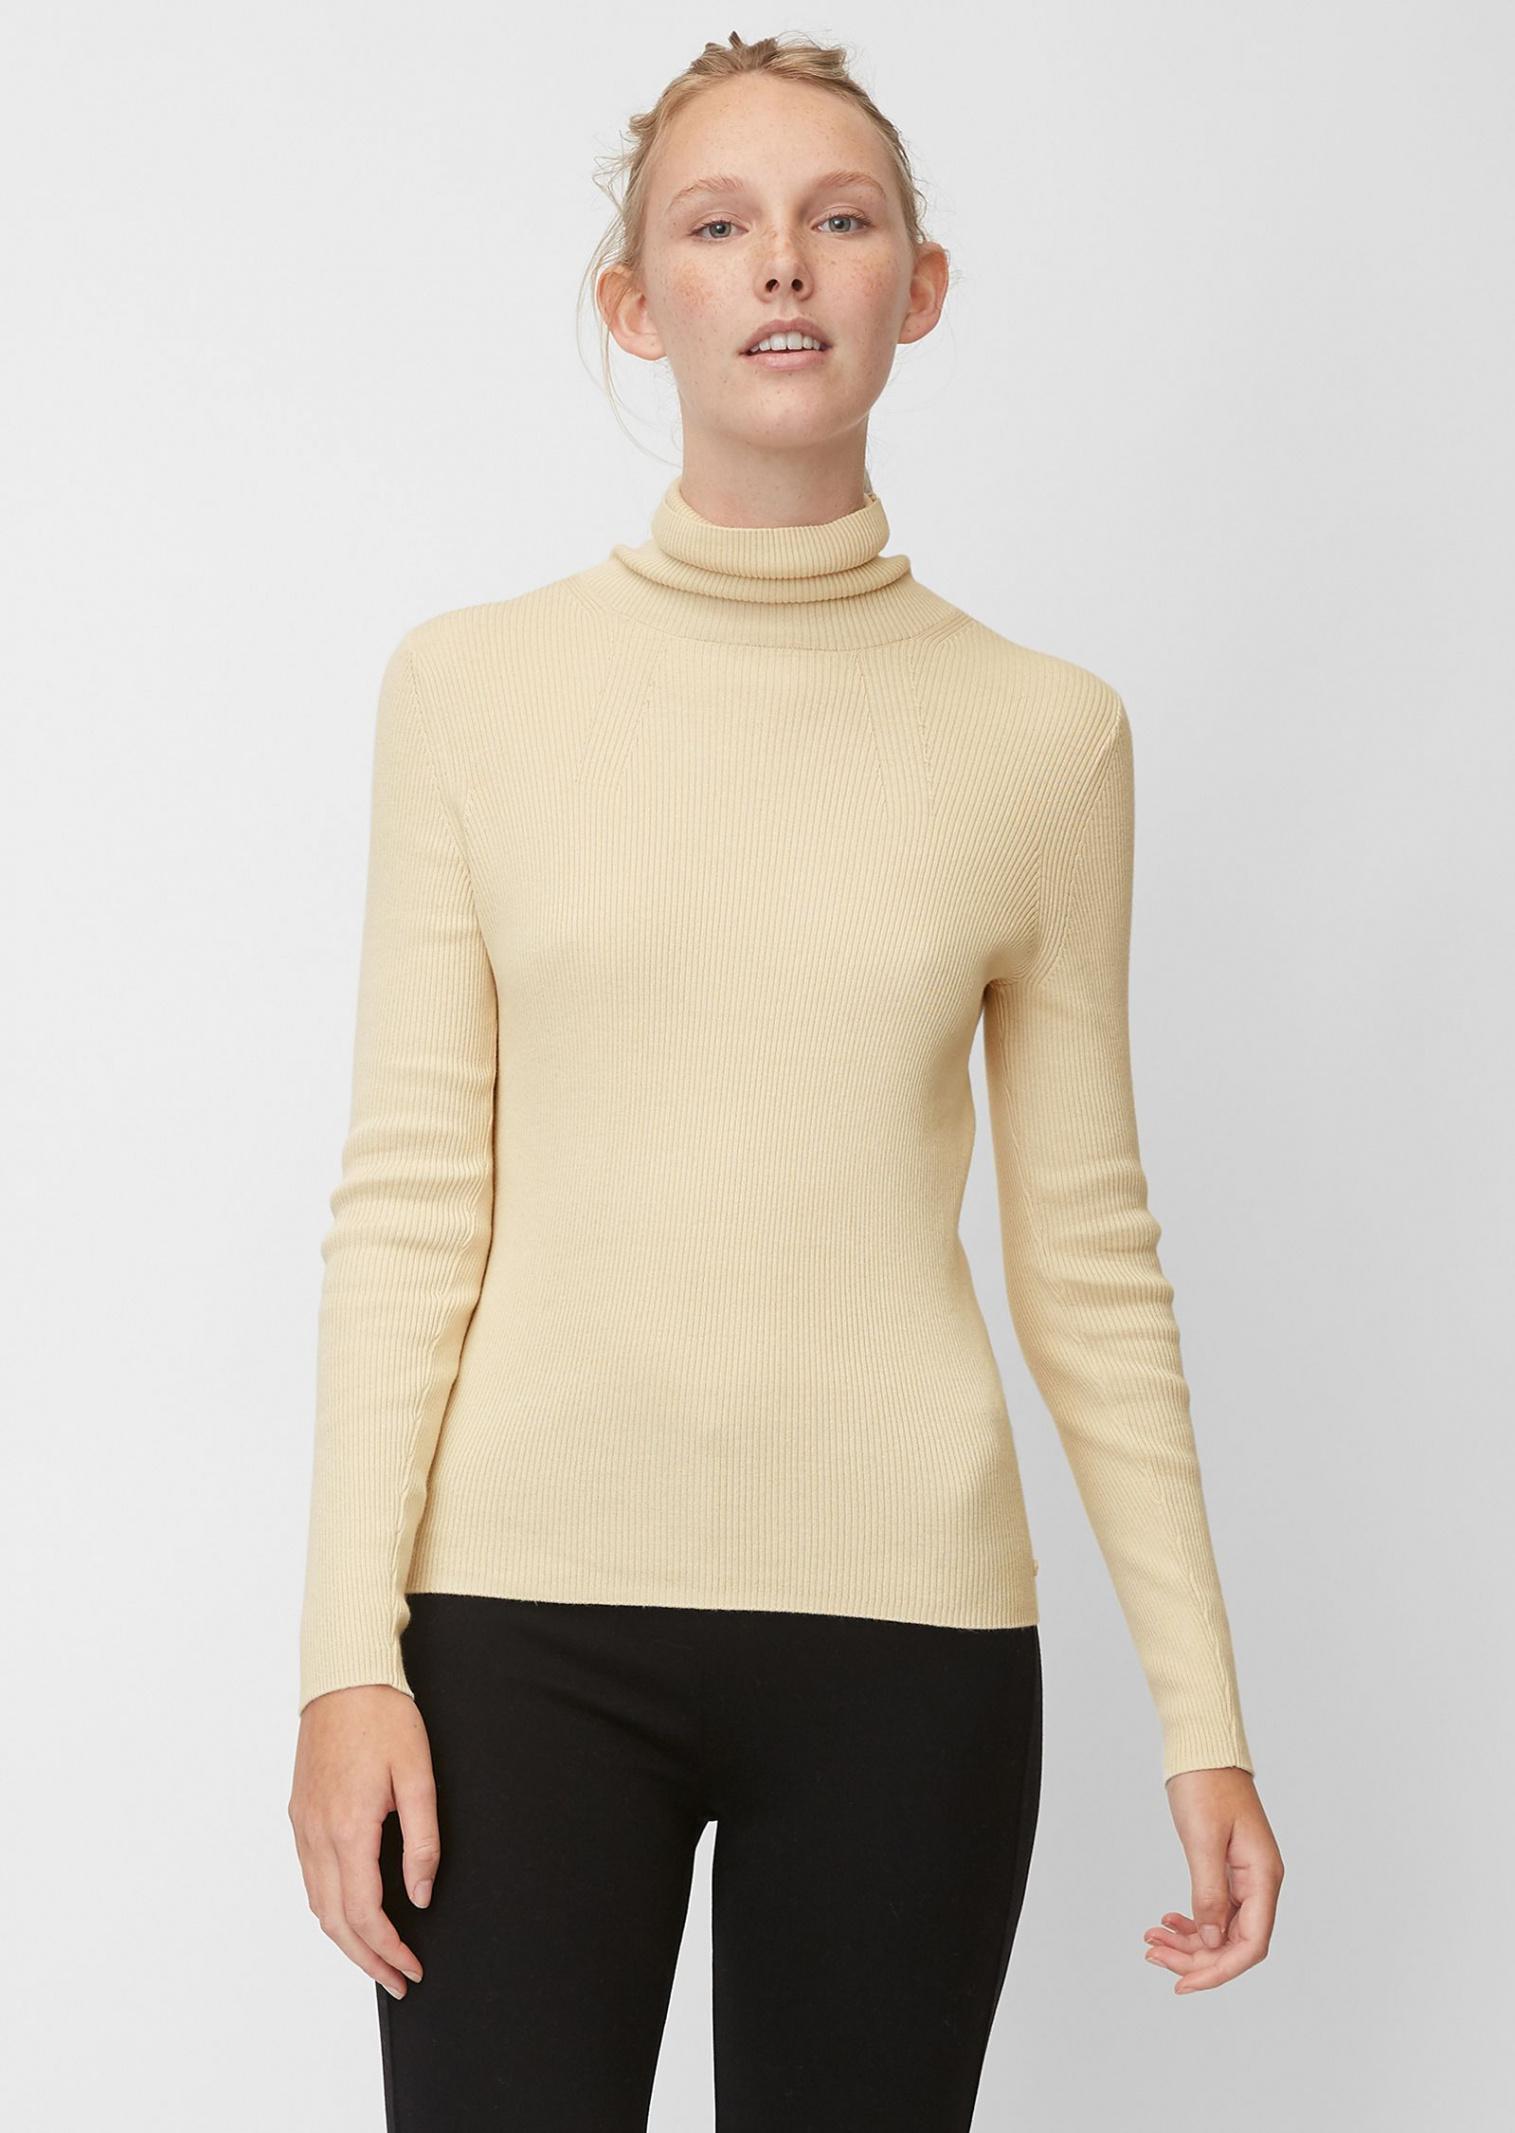 Кофты и свитера женские MARC O'POLO модель PF3858 характеристики, 2017